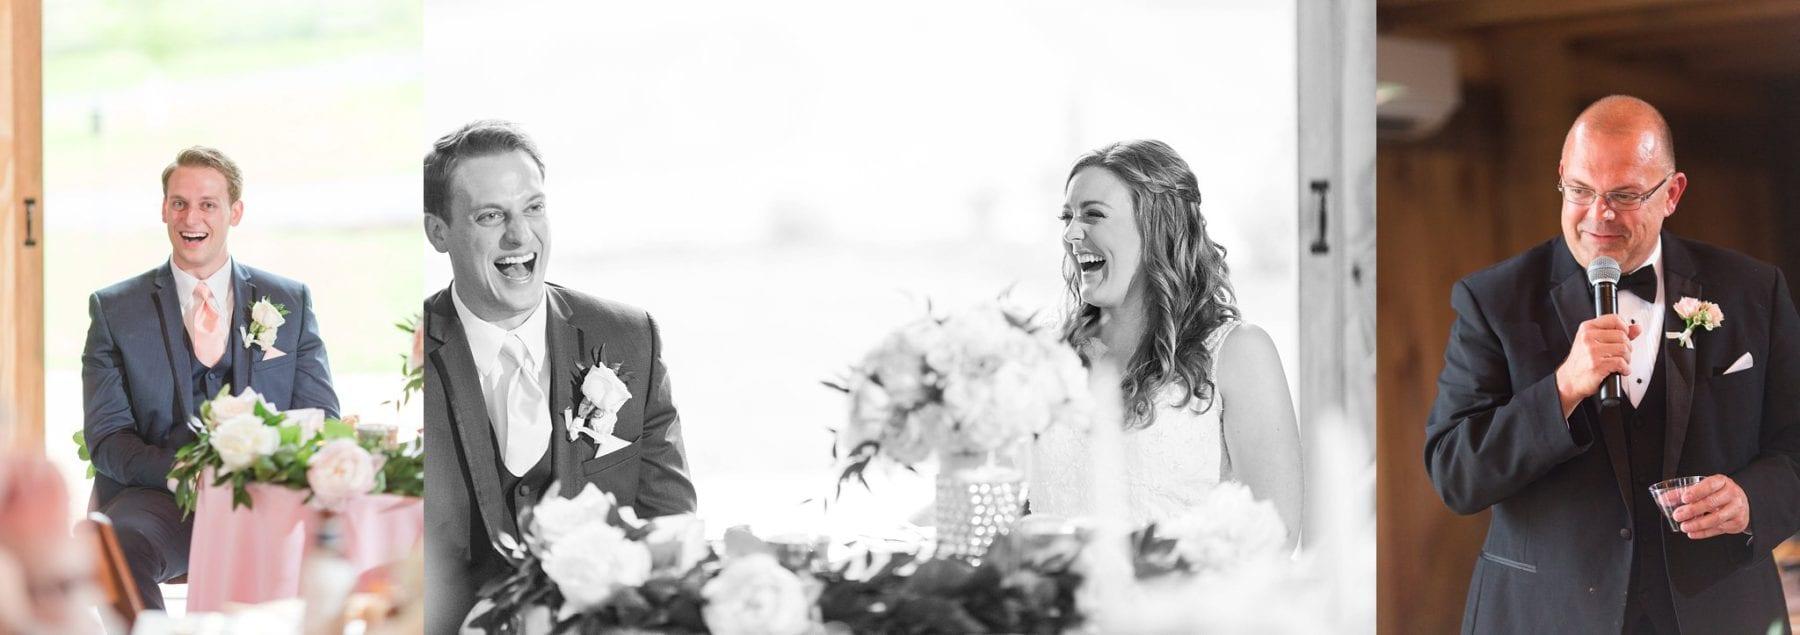 Justin & Megan Big Spring Farm Wedding Photos-465.jpg